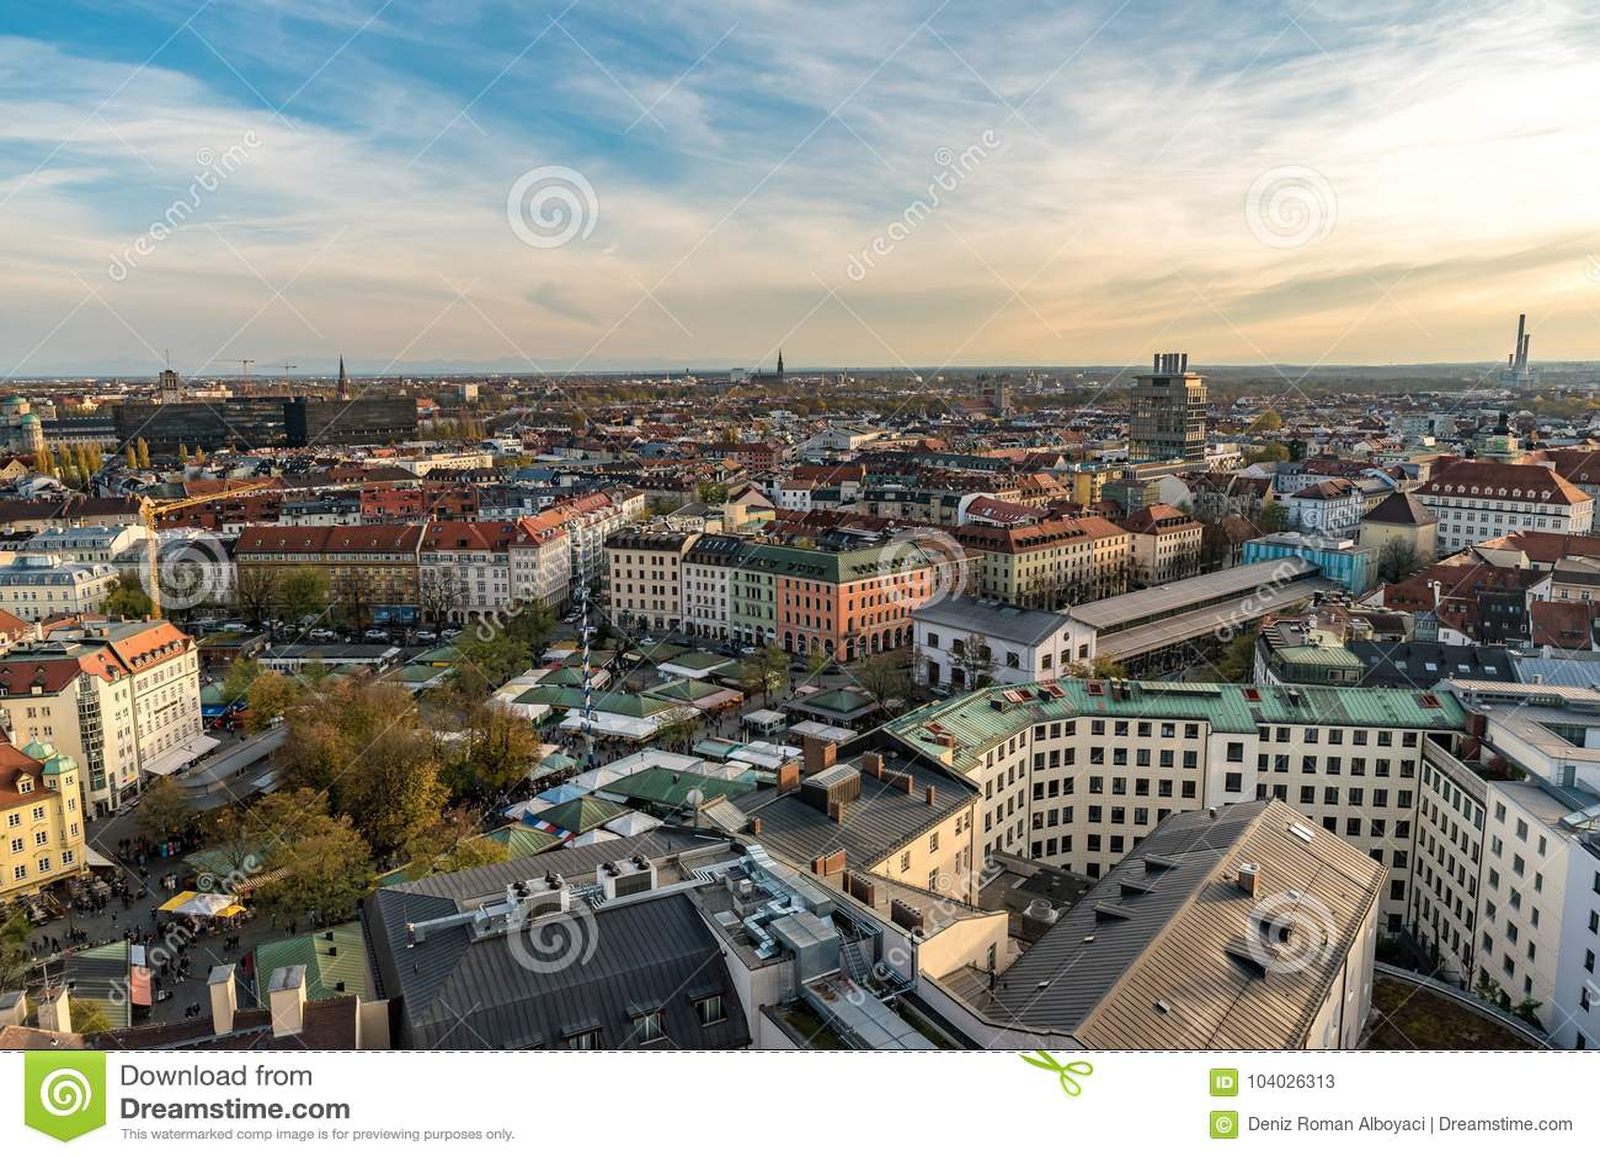 Paisaje urbano de Munich con objeto de las montañas